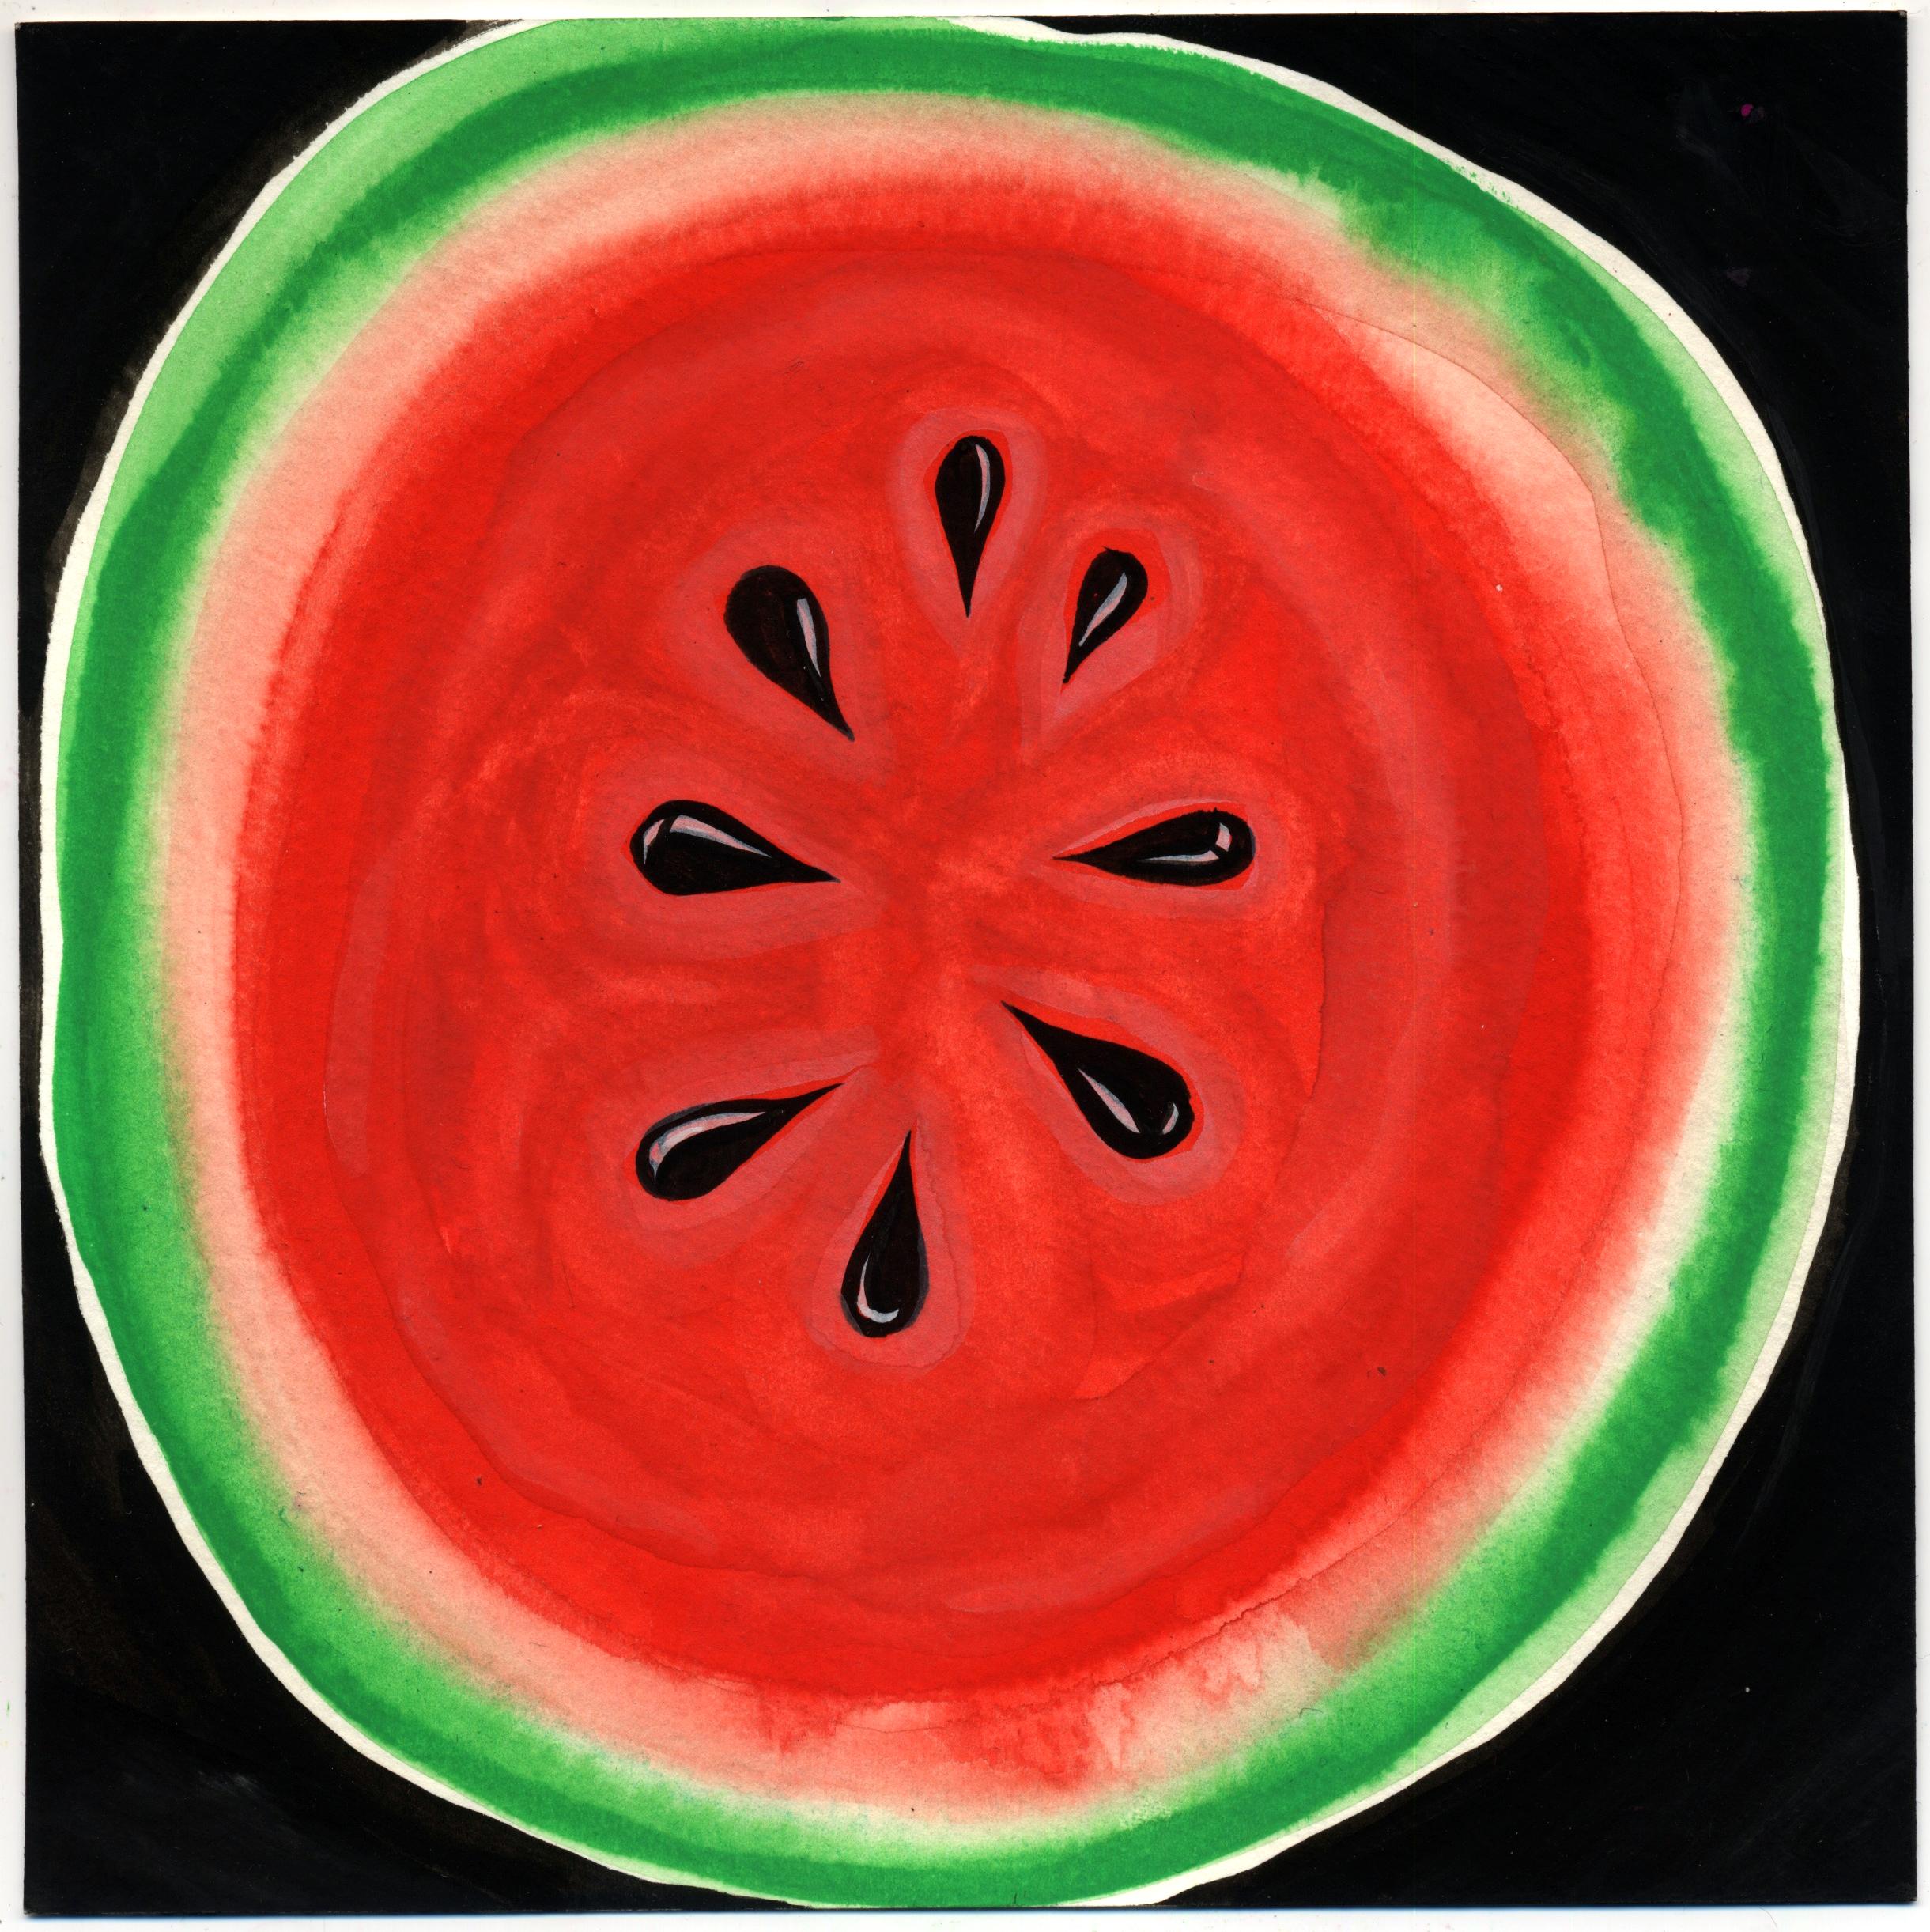 watermelonslice.jpg